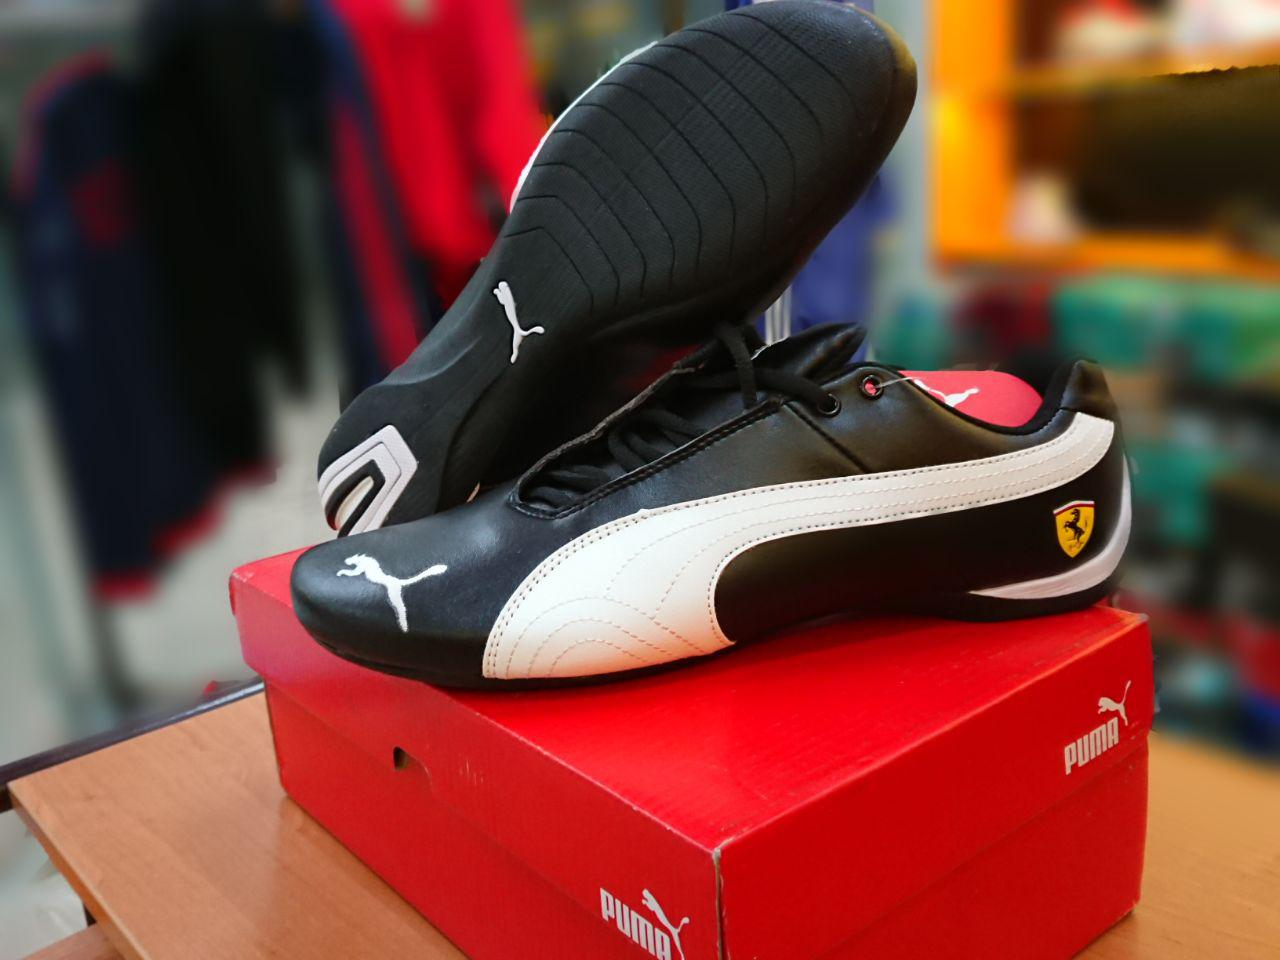 Кроссовки Puma Ferrari Design Black\white - фото 2